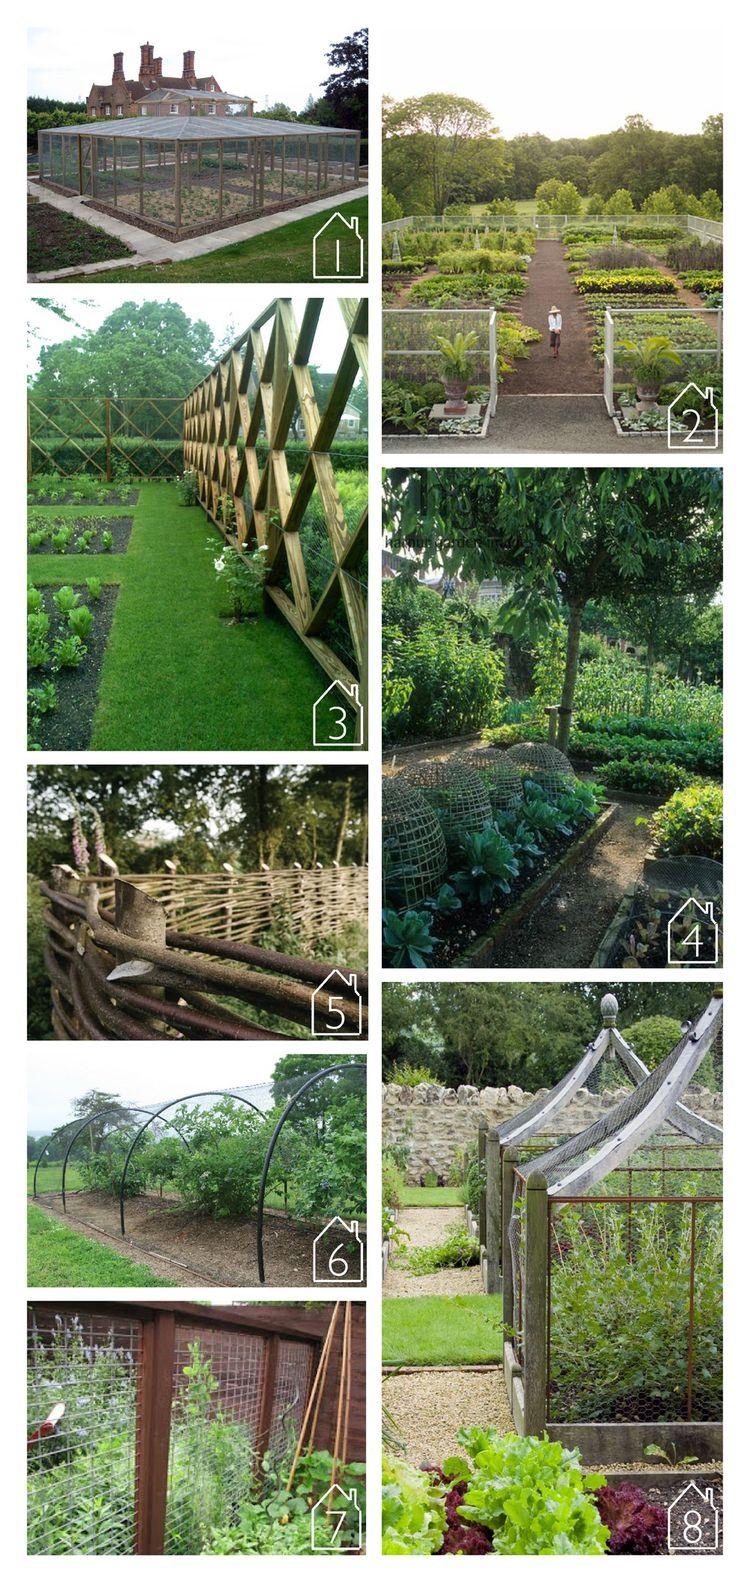 Garden Fencing Garden Fencing Garden Garden Images